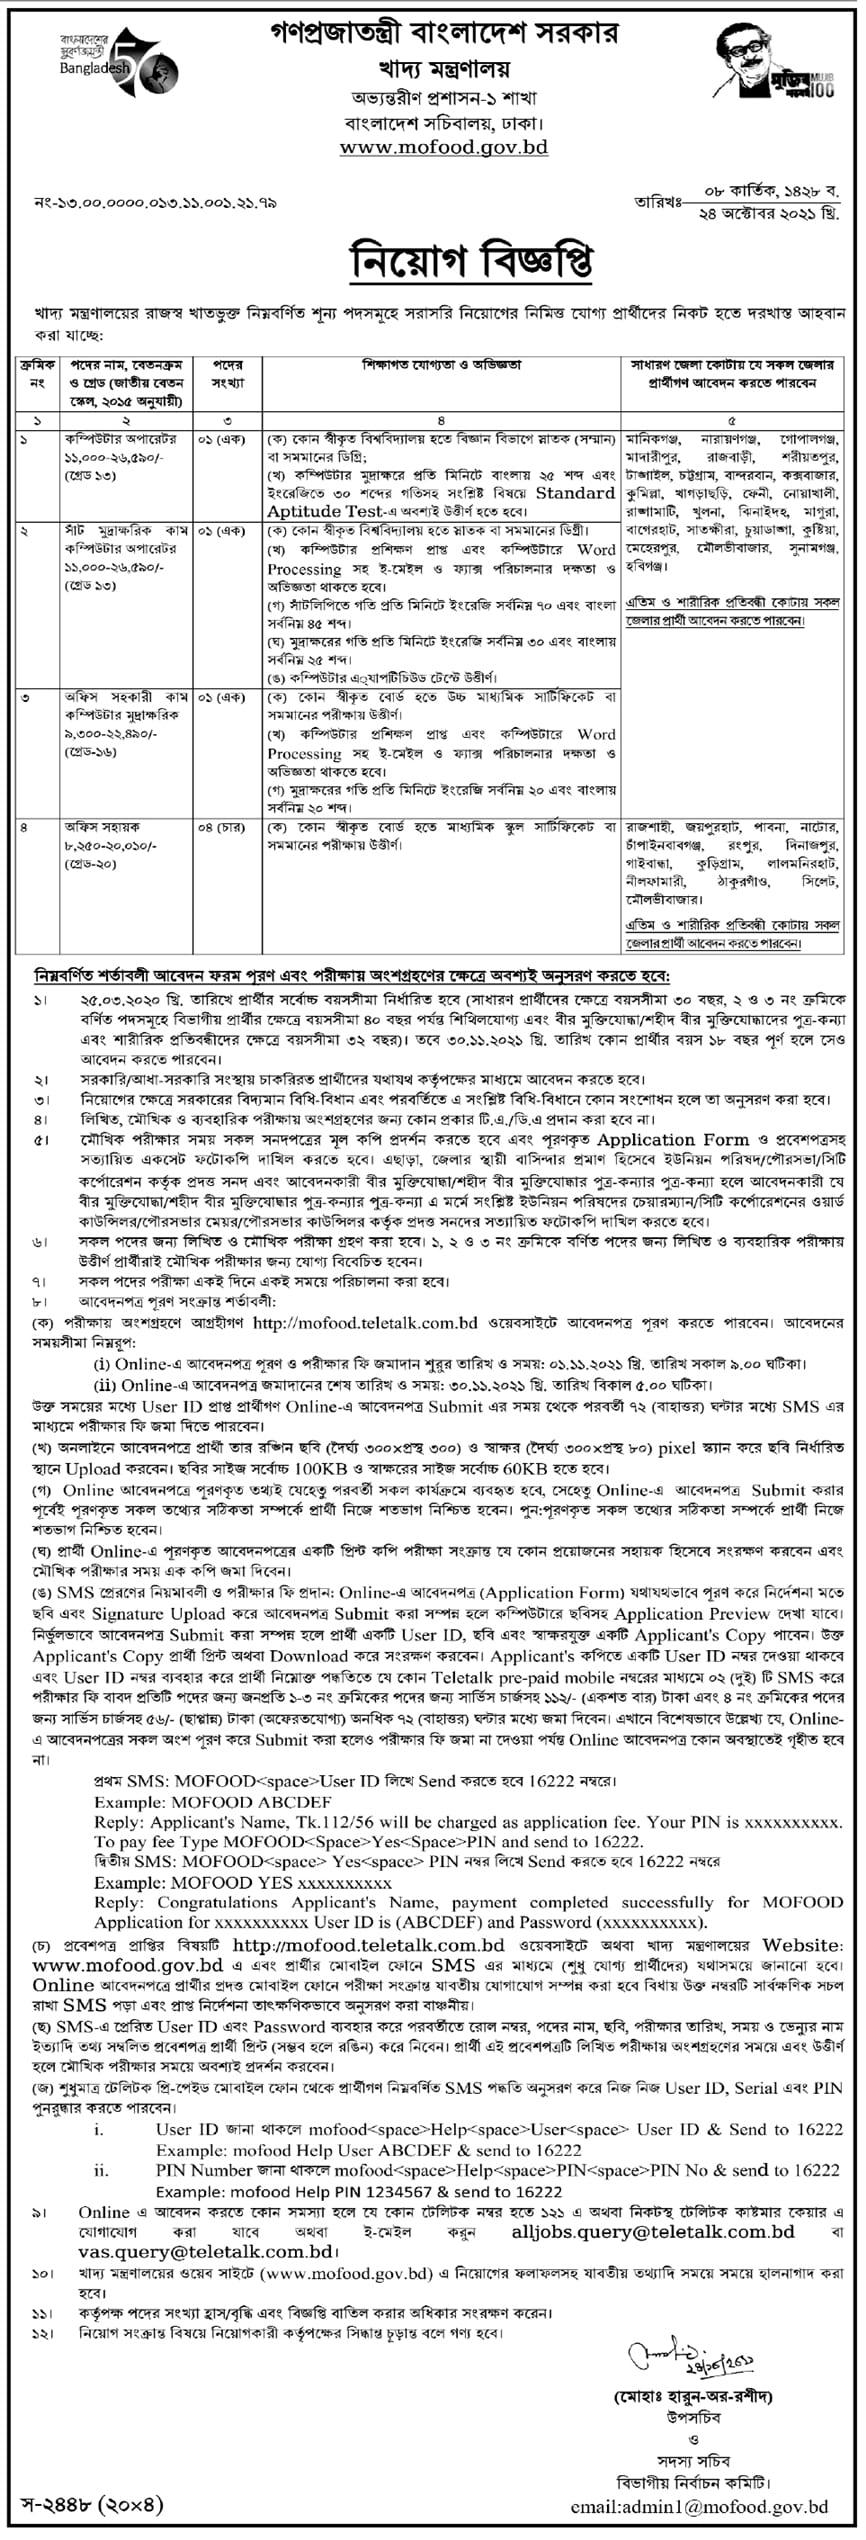 Ministry of Food Job Circular 2021